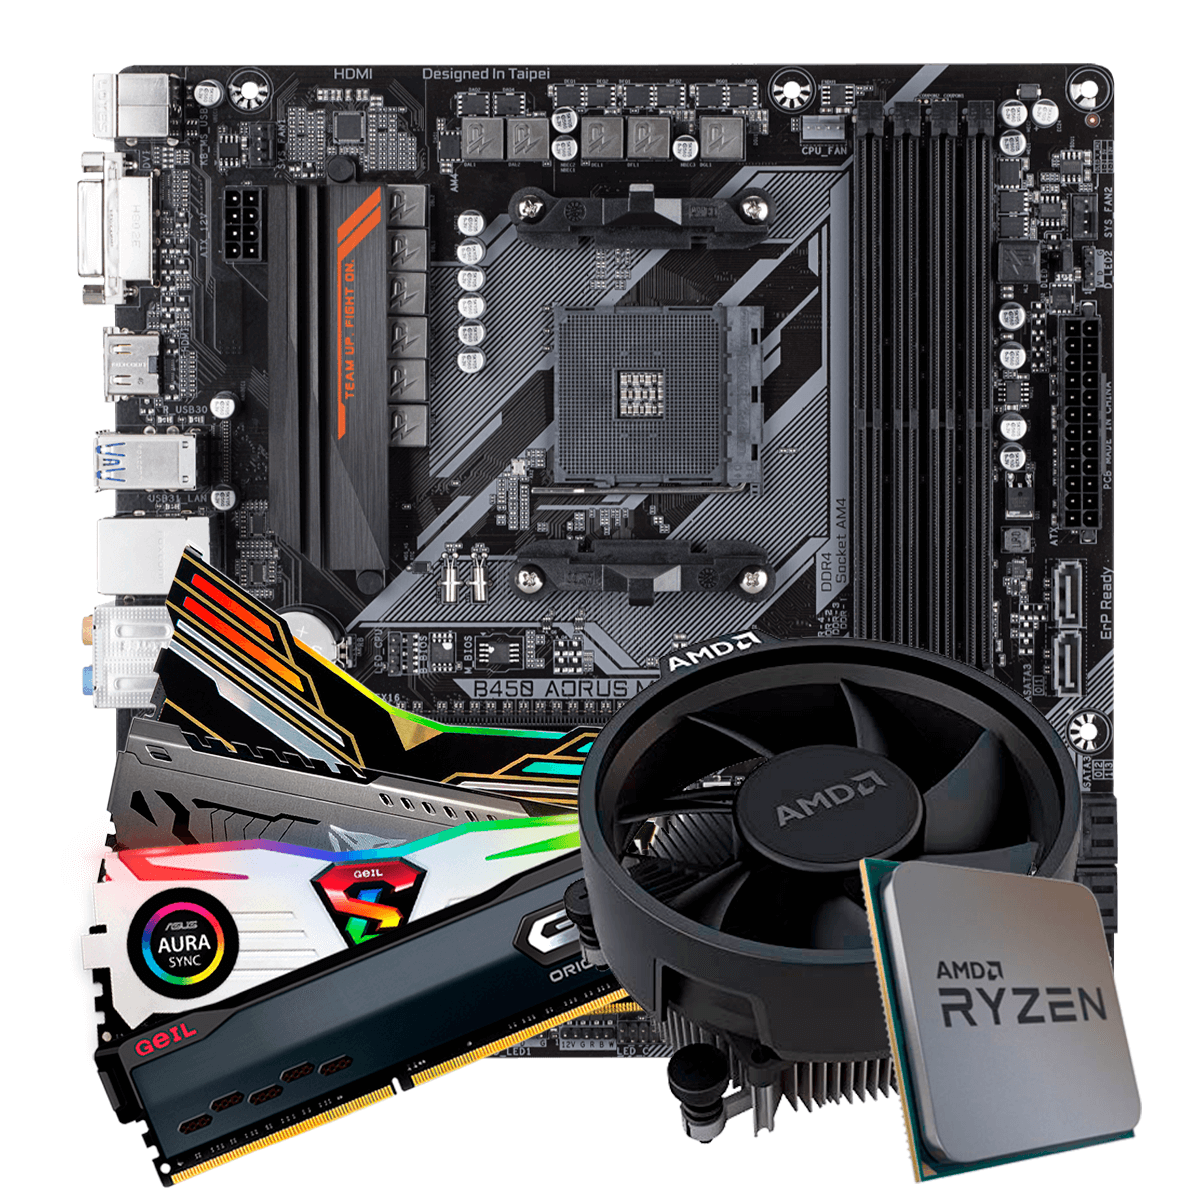 Kit Upgrade, AMD Ryzen 5 3500, Gigabyte B450 AORUS M, Memória DDR4 16GB 3000MHz